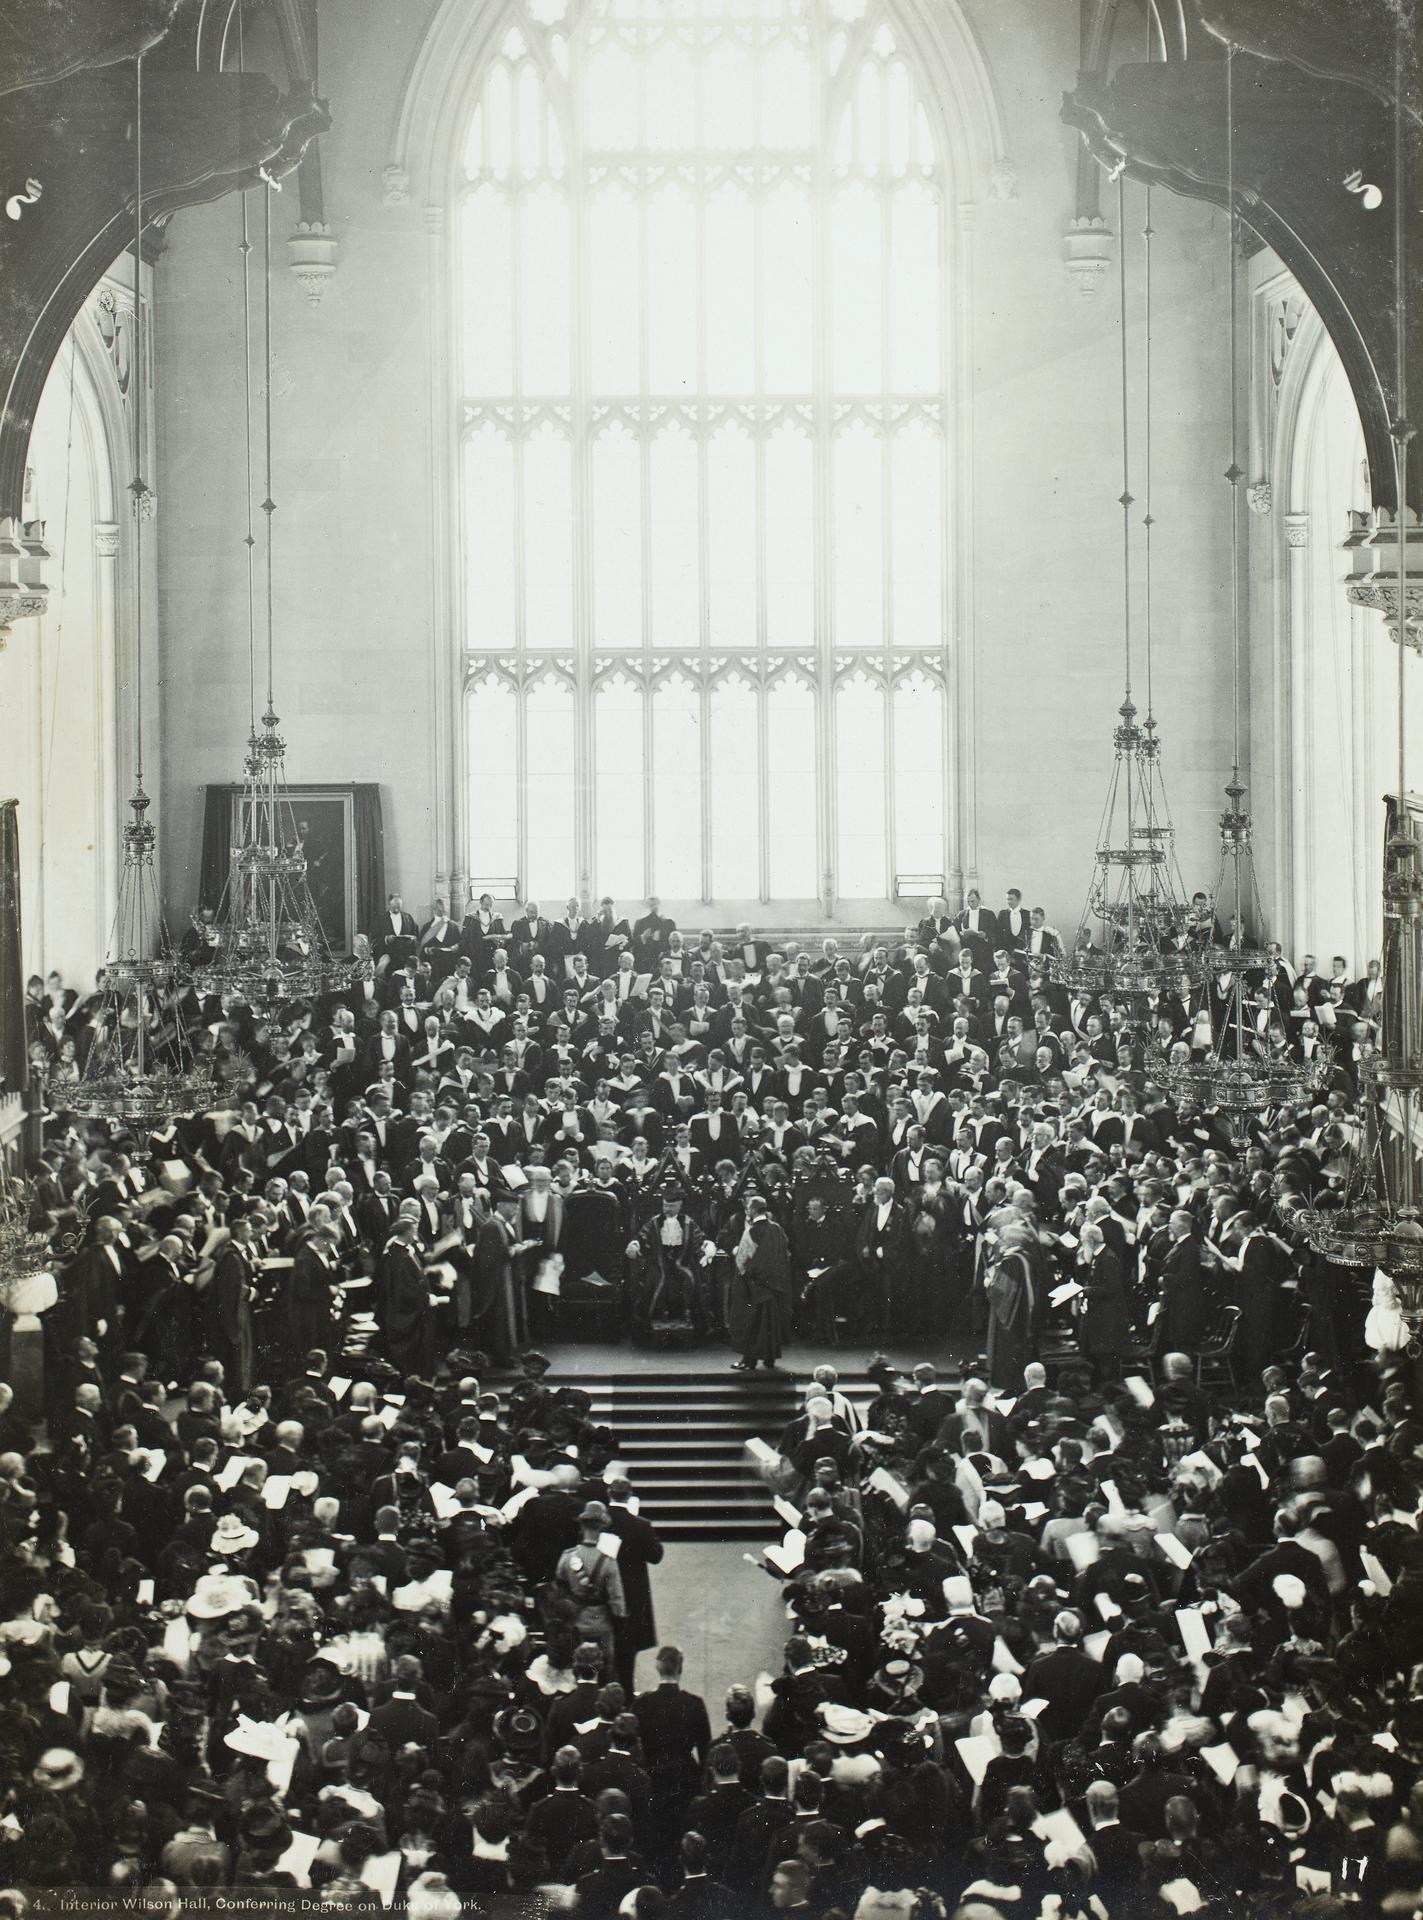 Degree conferring, 1901